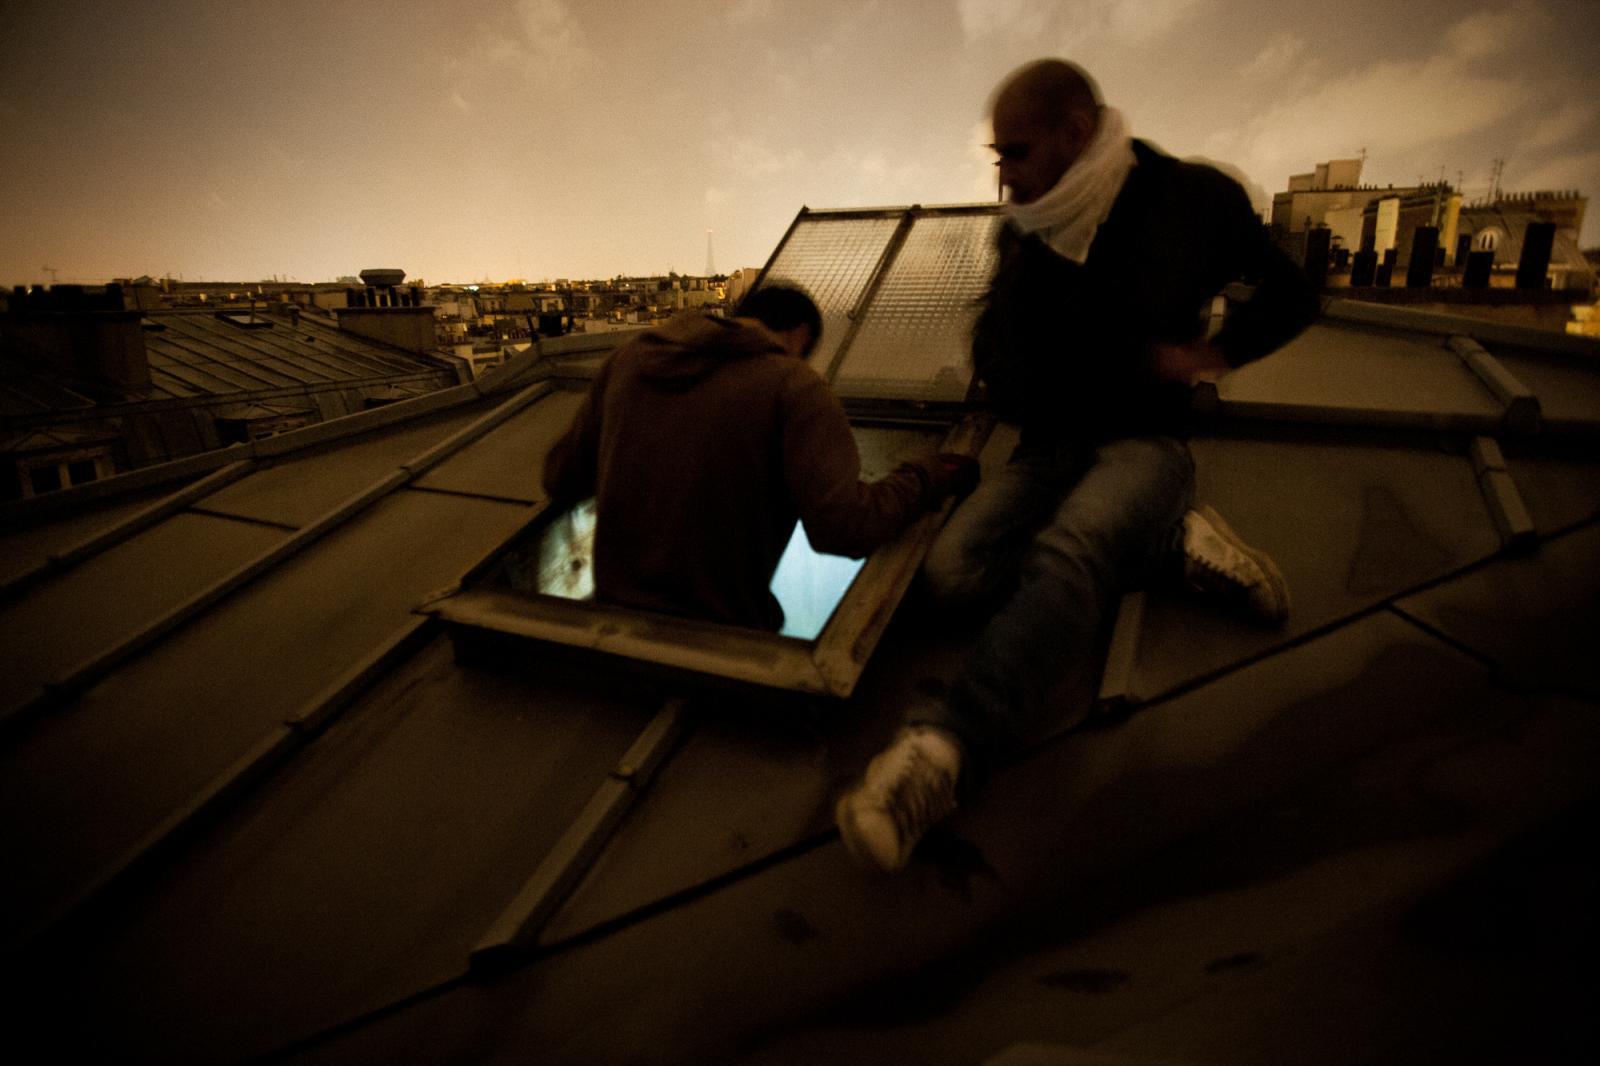 Photography image - Loading juj_roof_investigations_002.jpg